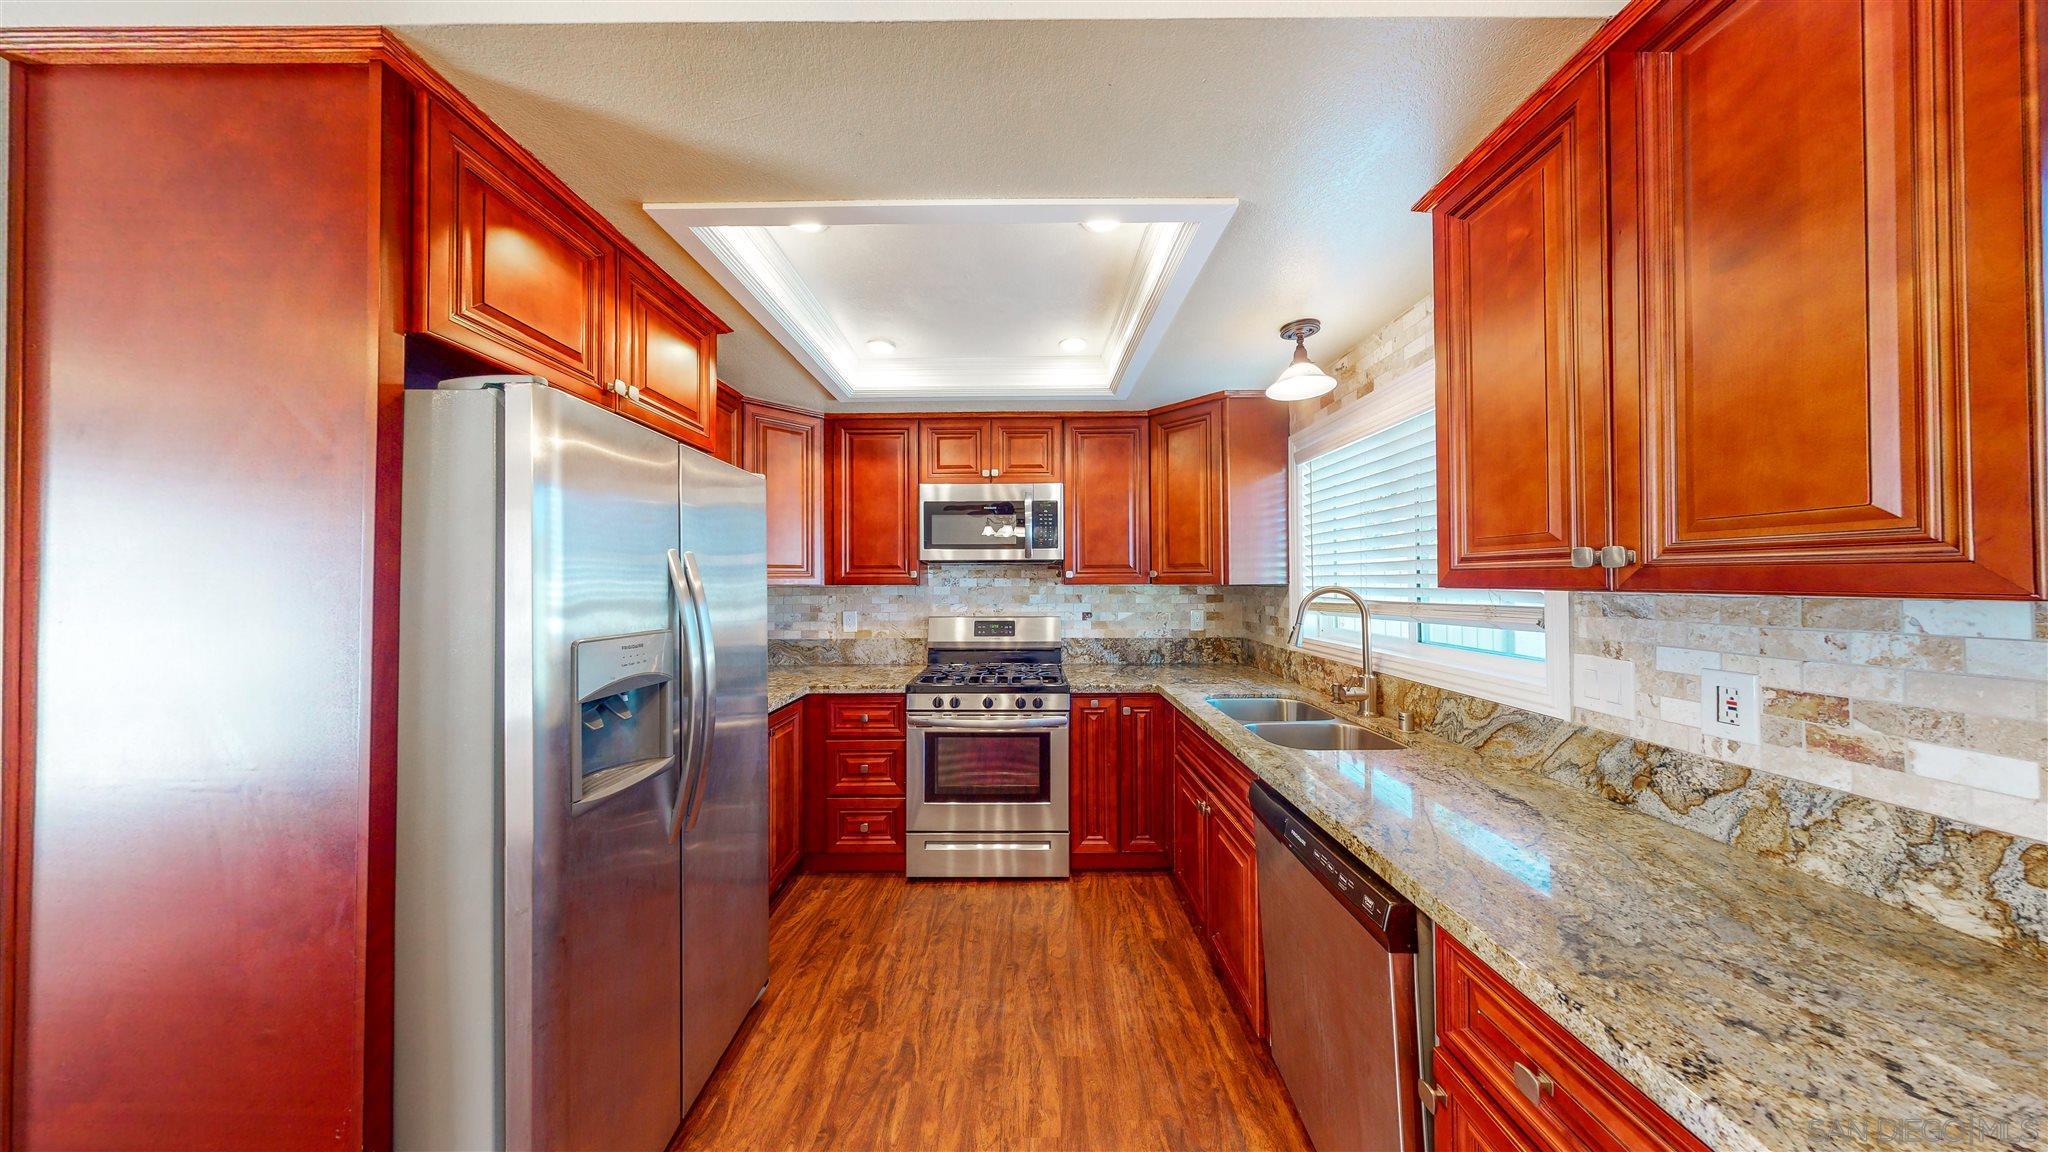 655 E Washington, El Cajon, California 92020, 2 Bedrooms Bedrooms, ,2 BathroomsBathrooms,Townhouse,For Sale,655 E Washington,1,210002309